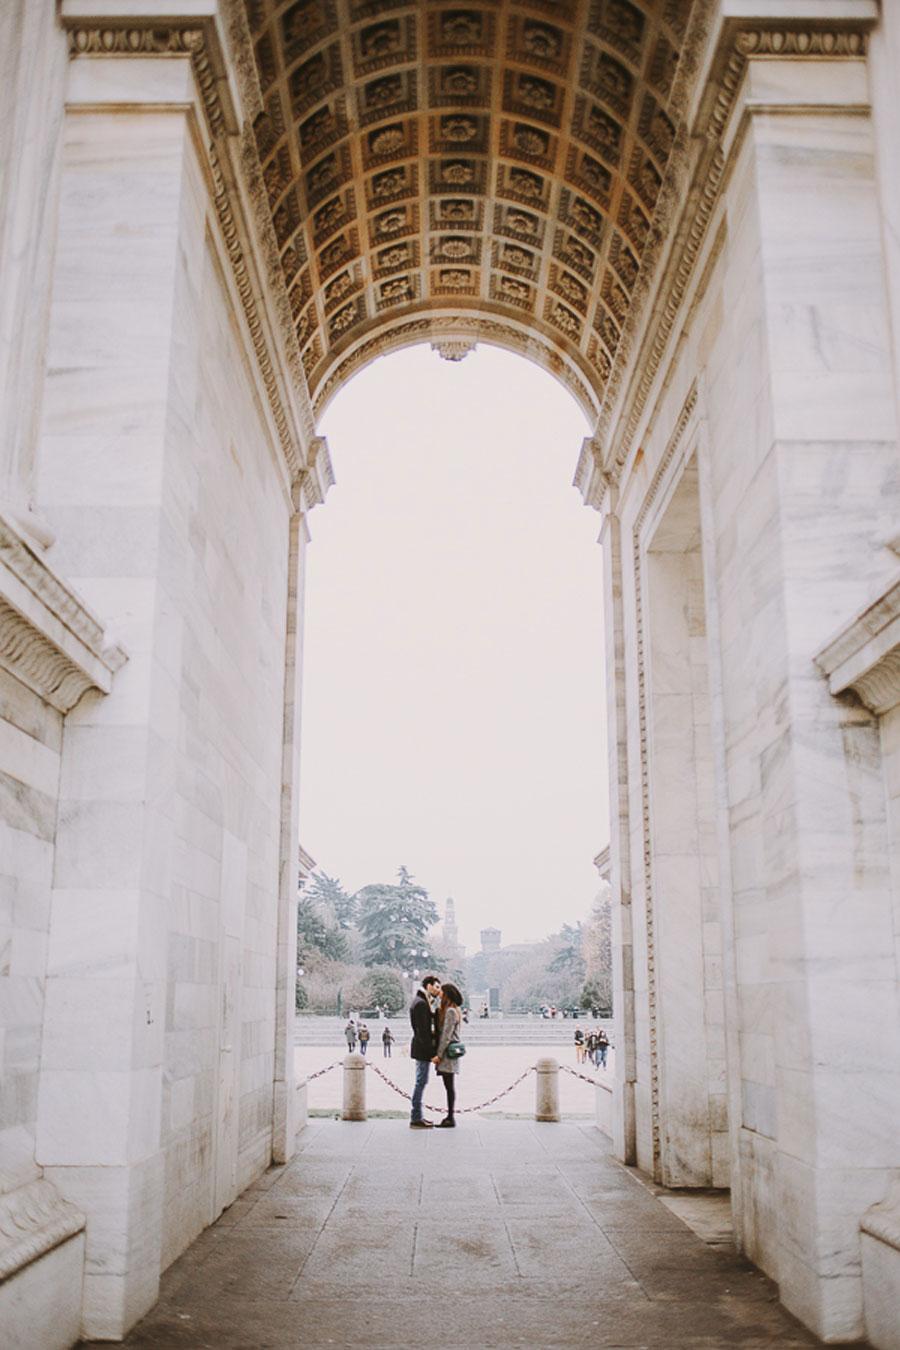 Engagement Sessions // Beautiful Milano Love Story! Floriana & Mario